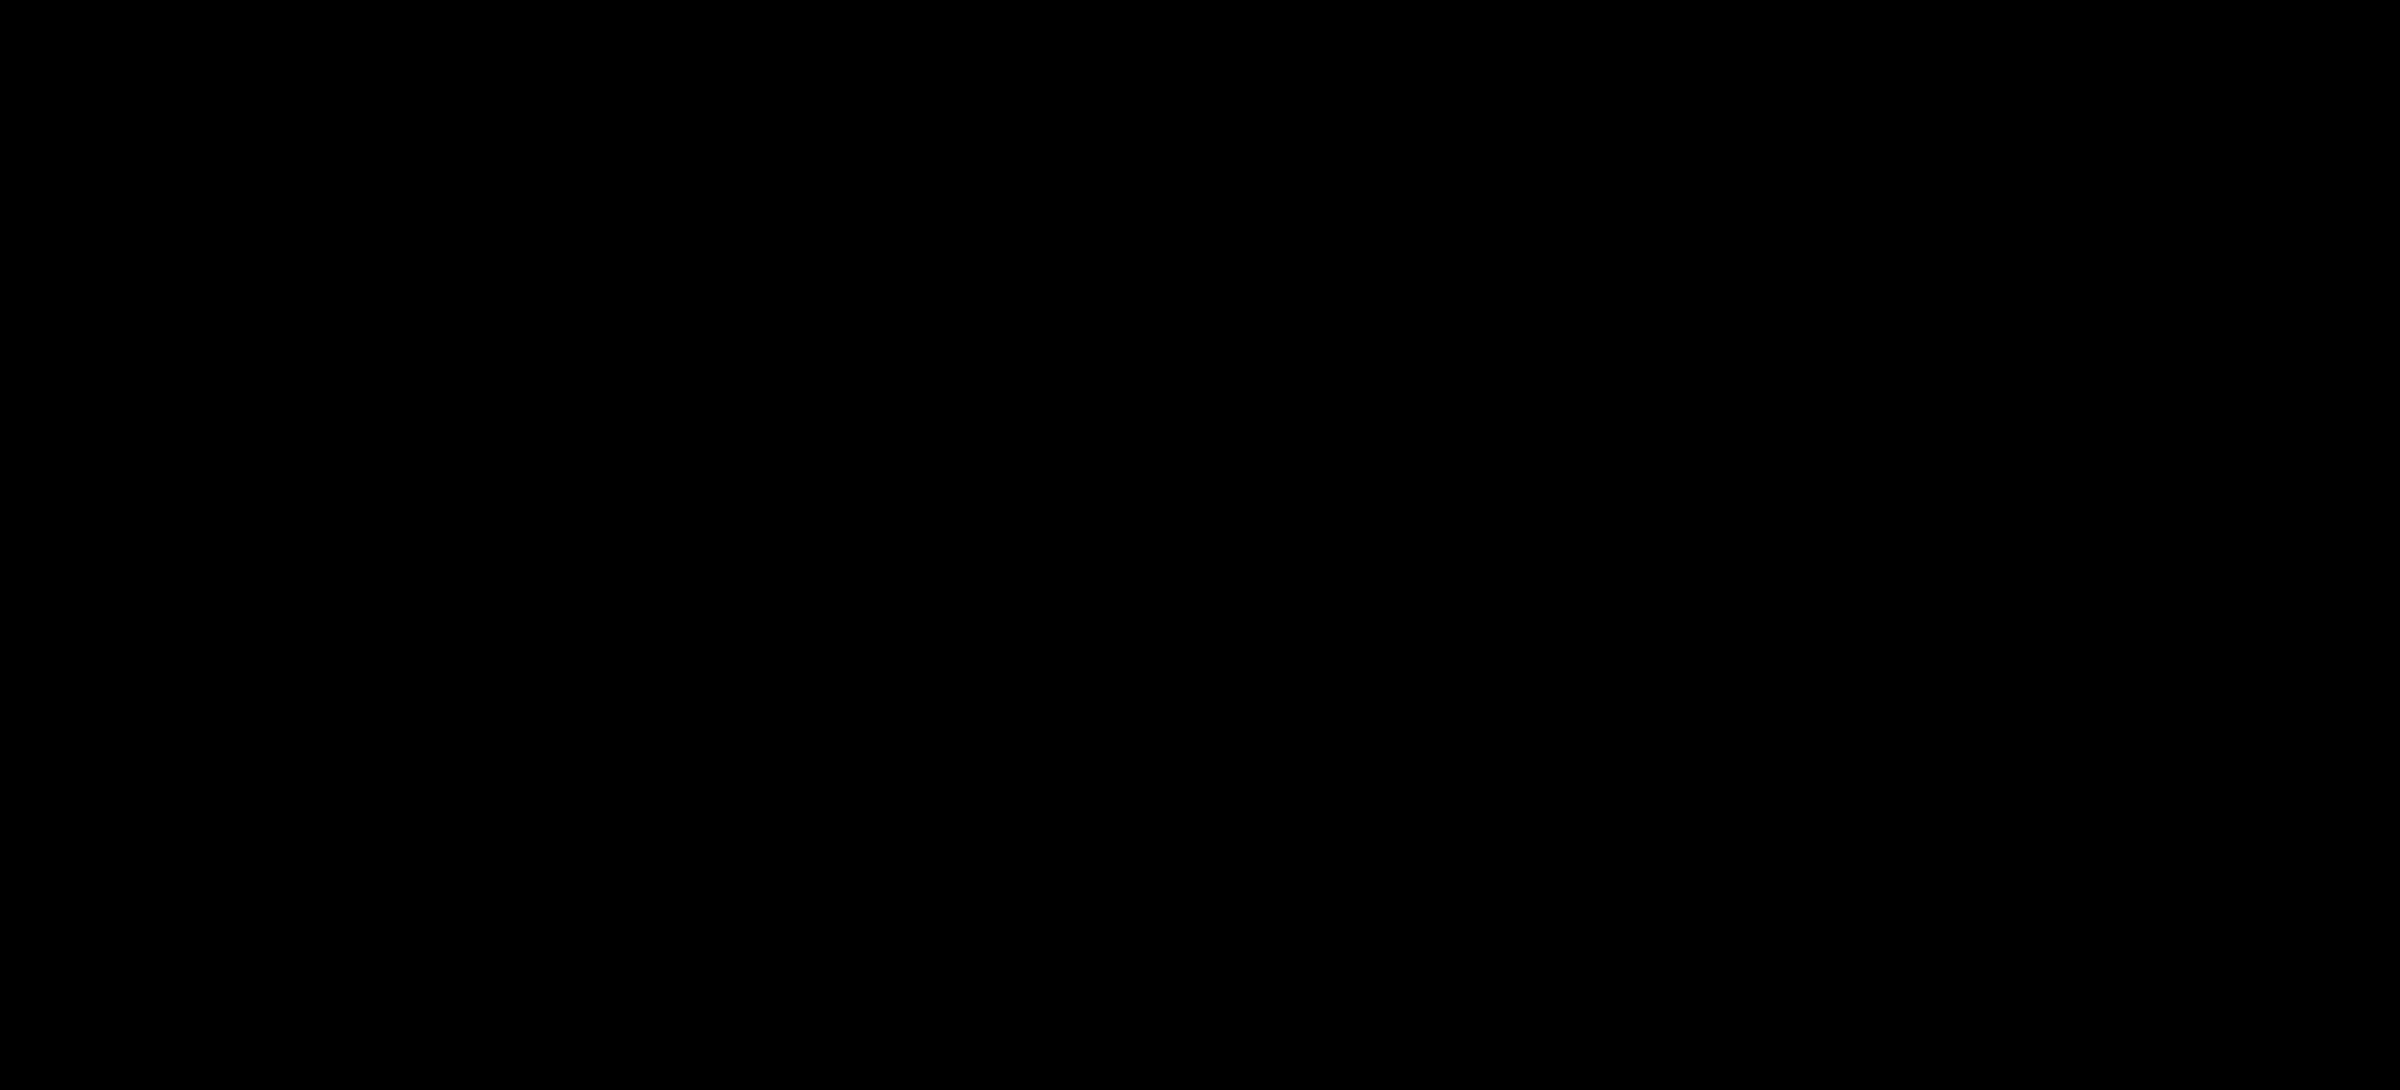 American Standard 2 Logo PNG Transparent & SVG Vector - Freebie Supply